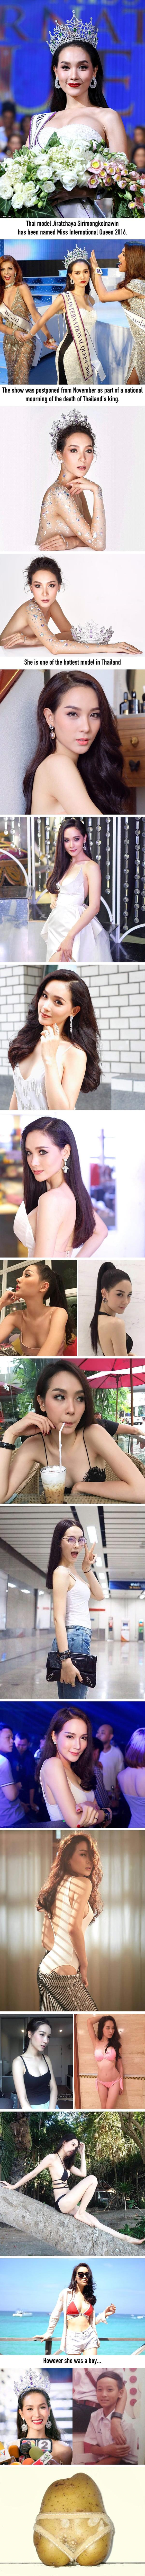 Please meet Jiratchaya Sirimongkolnawin, named miss international queen 2016 in Thailand